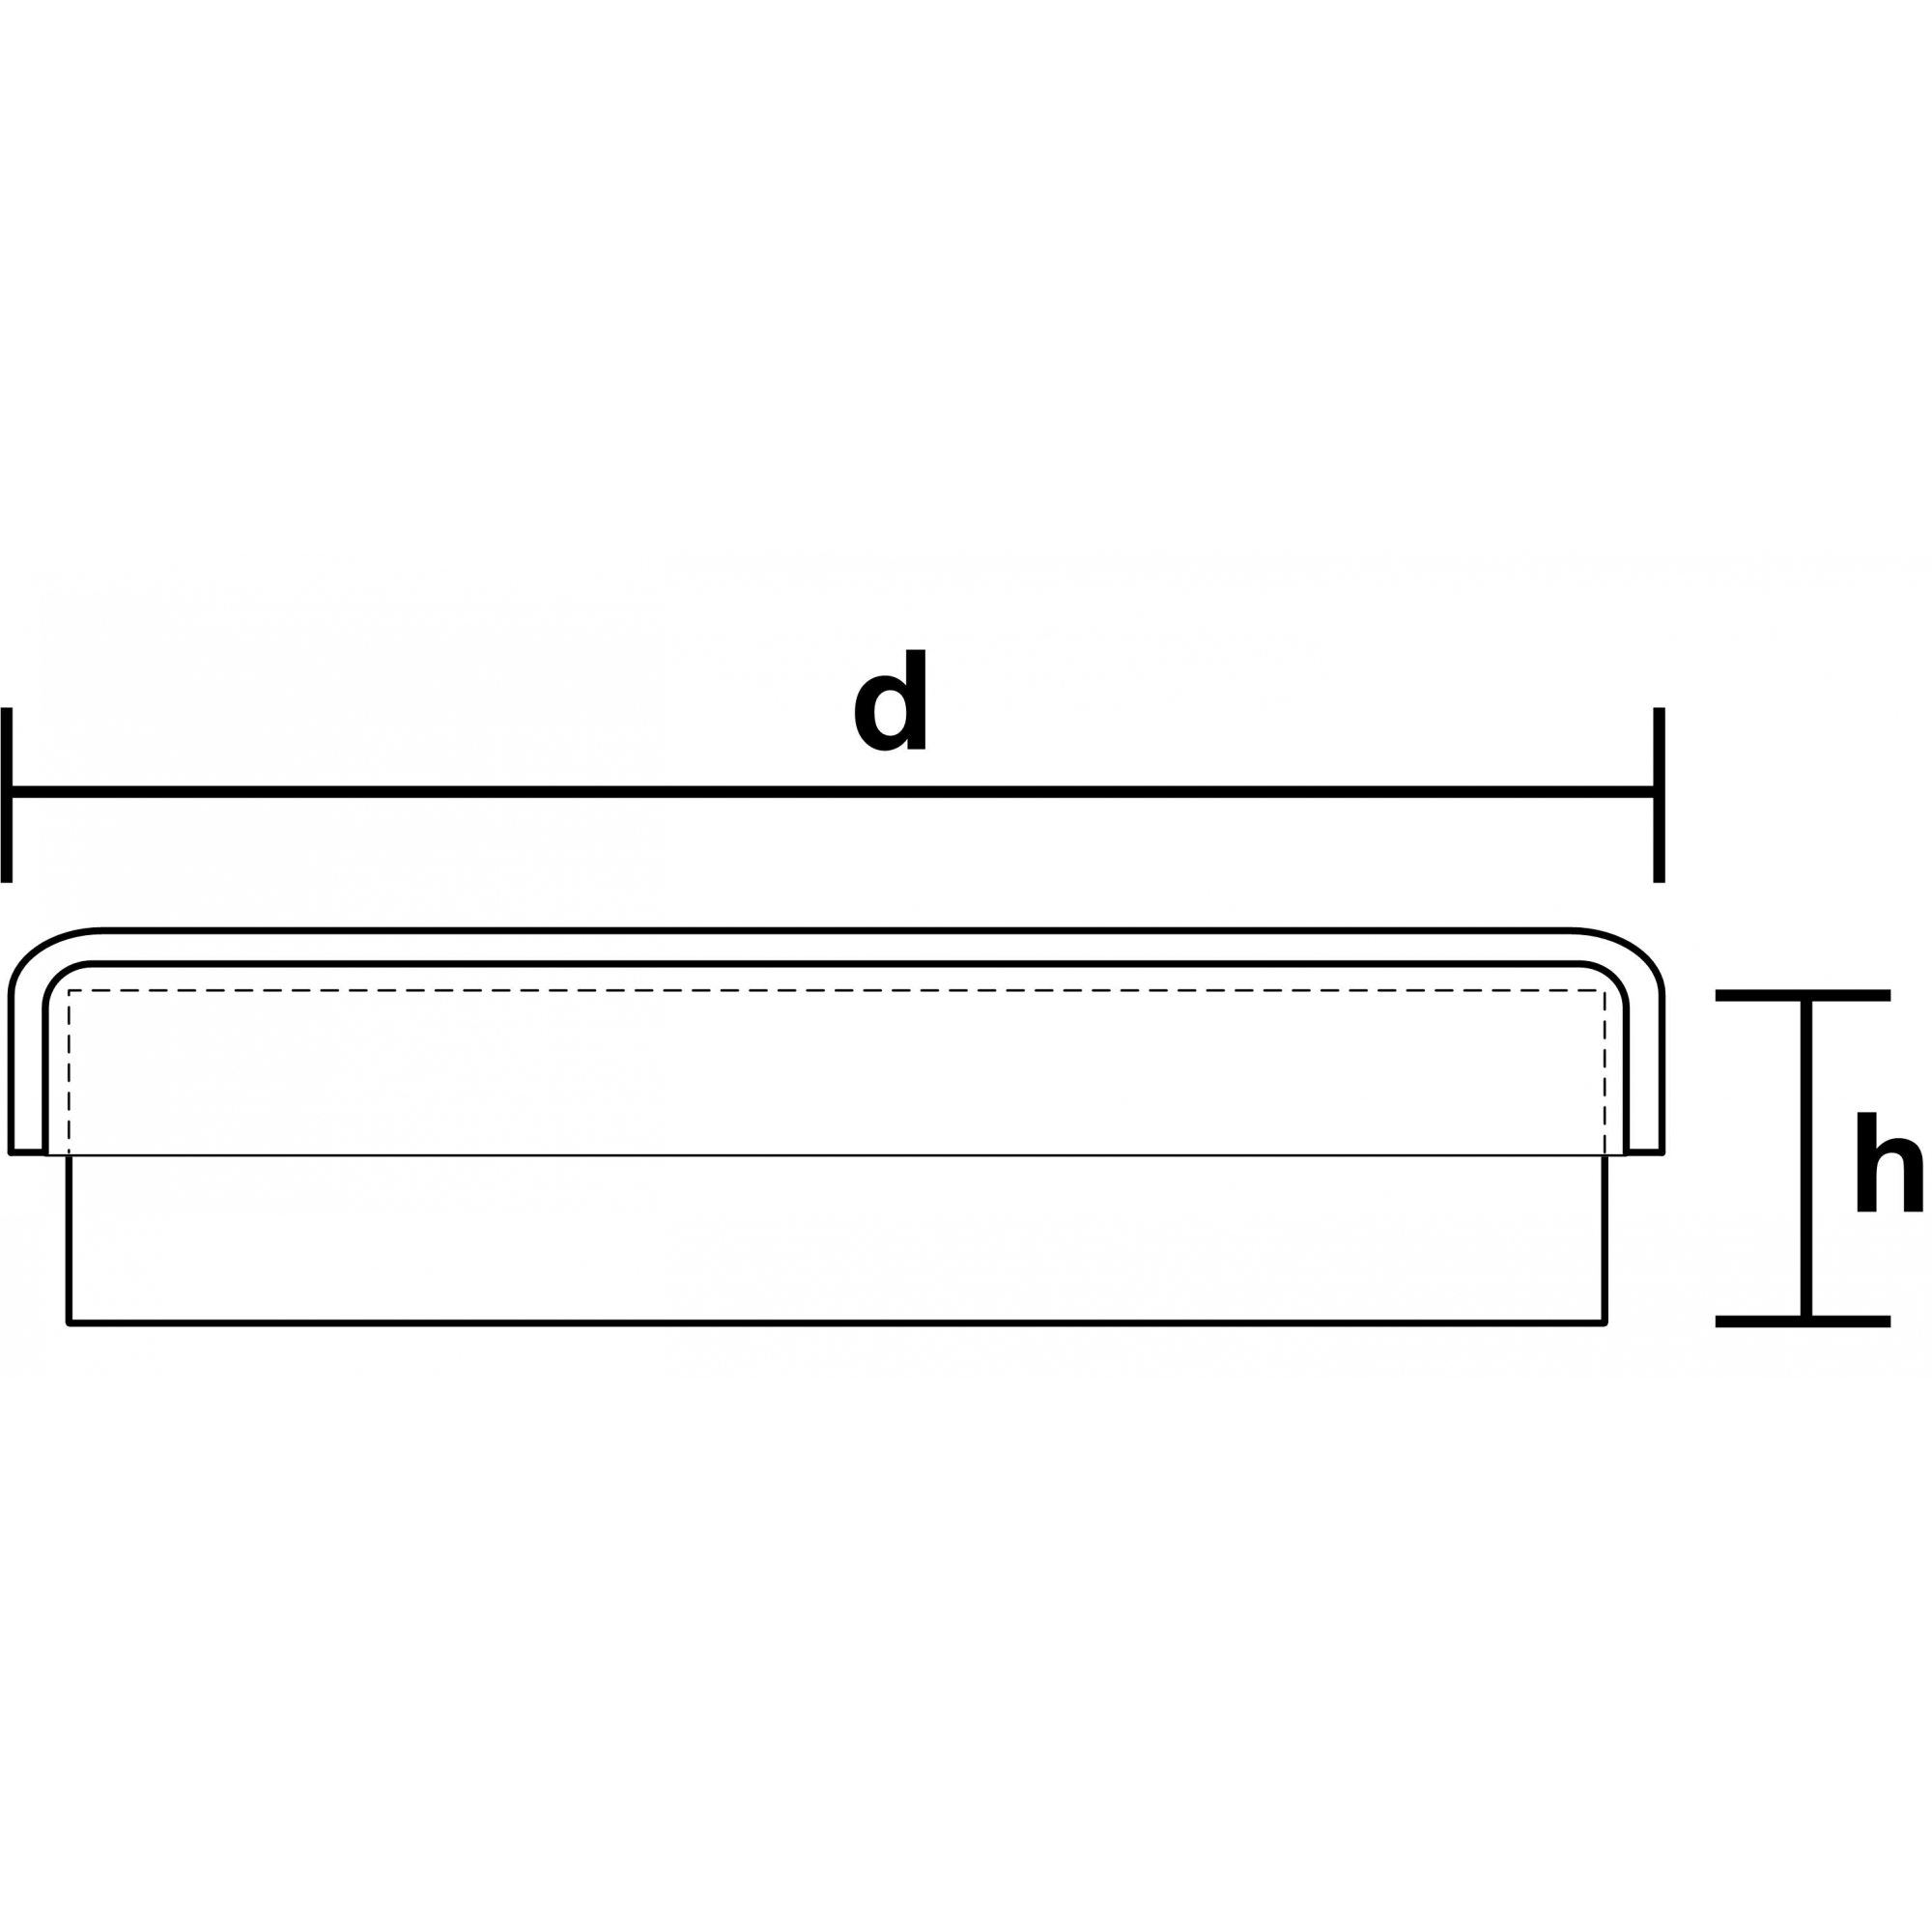 PLACA DE PETRI 80 X 15 MM - Laborglas - Cód. 9375542